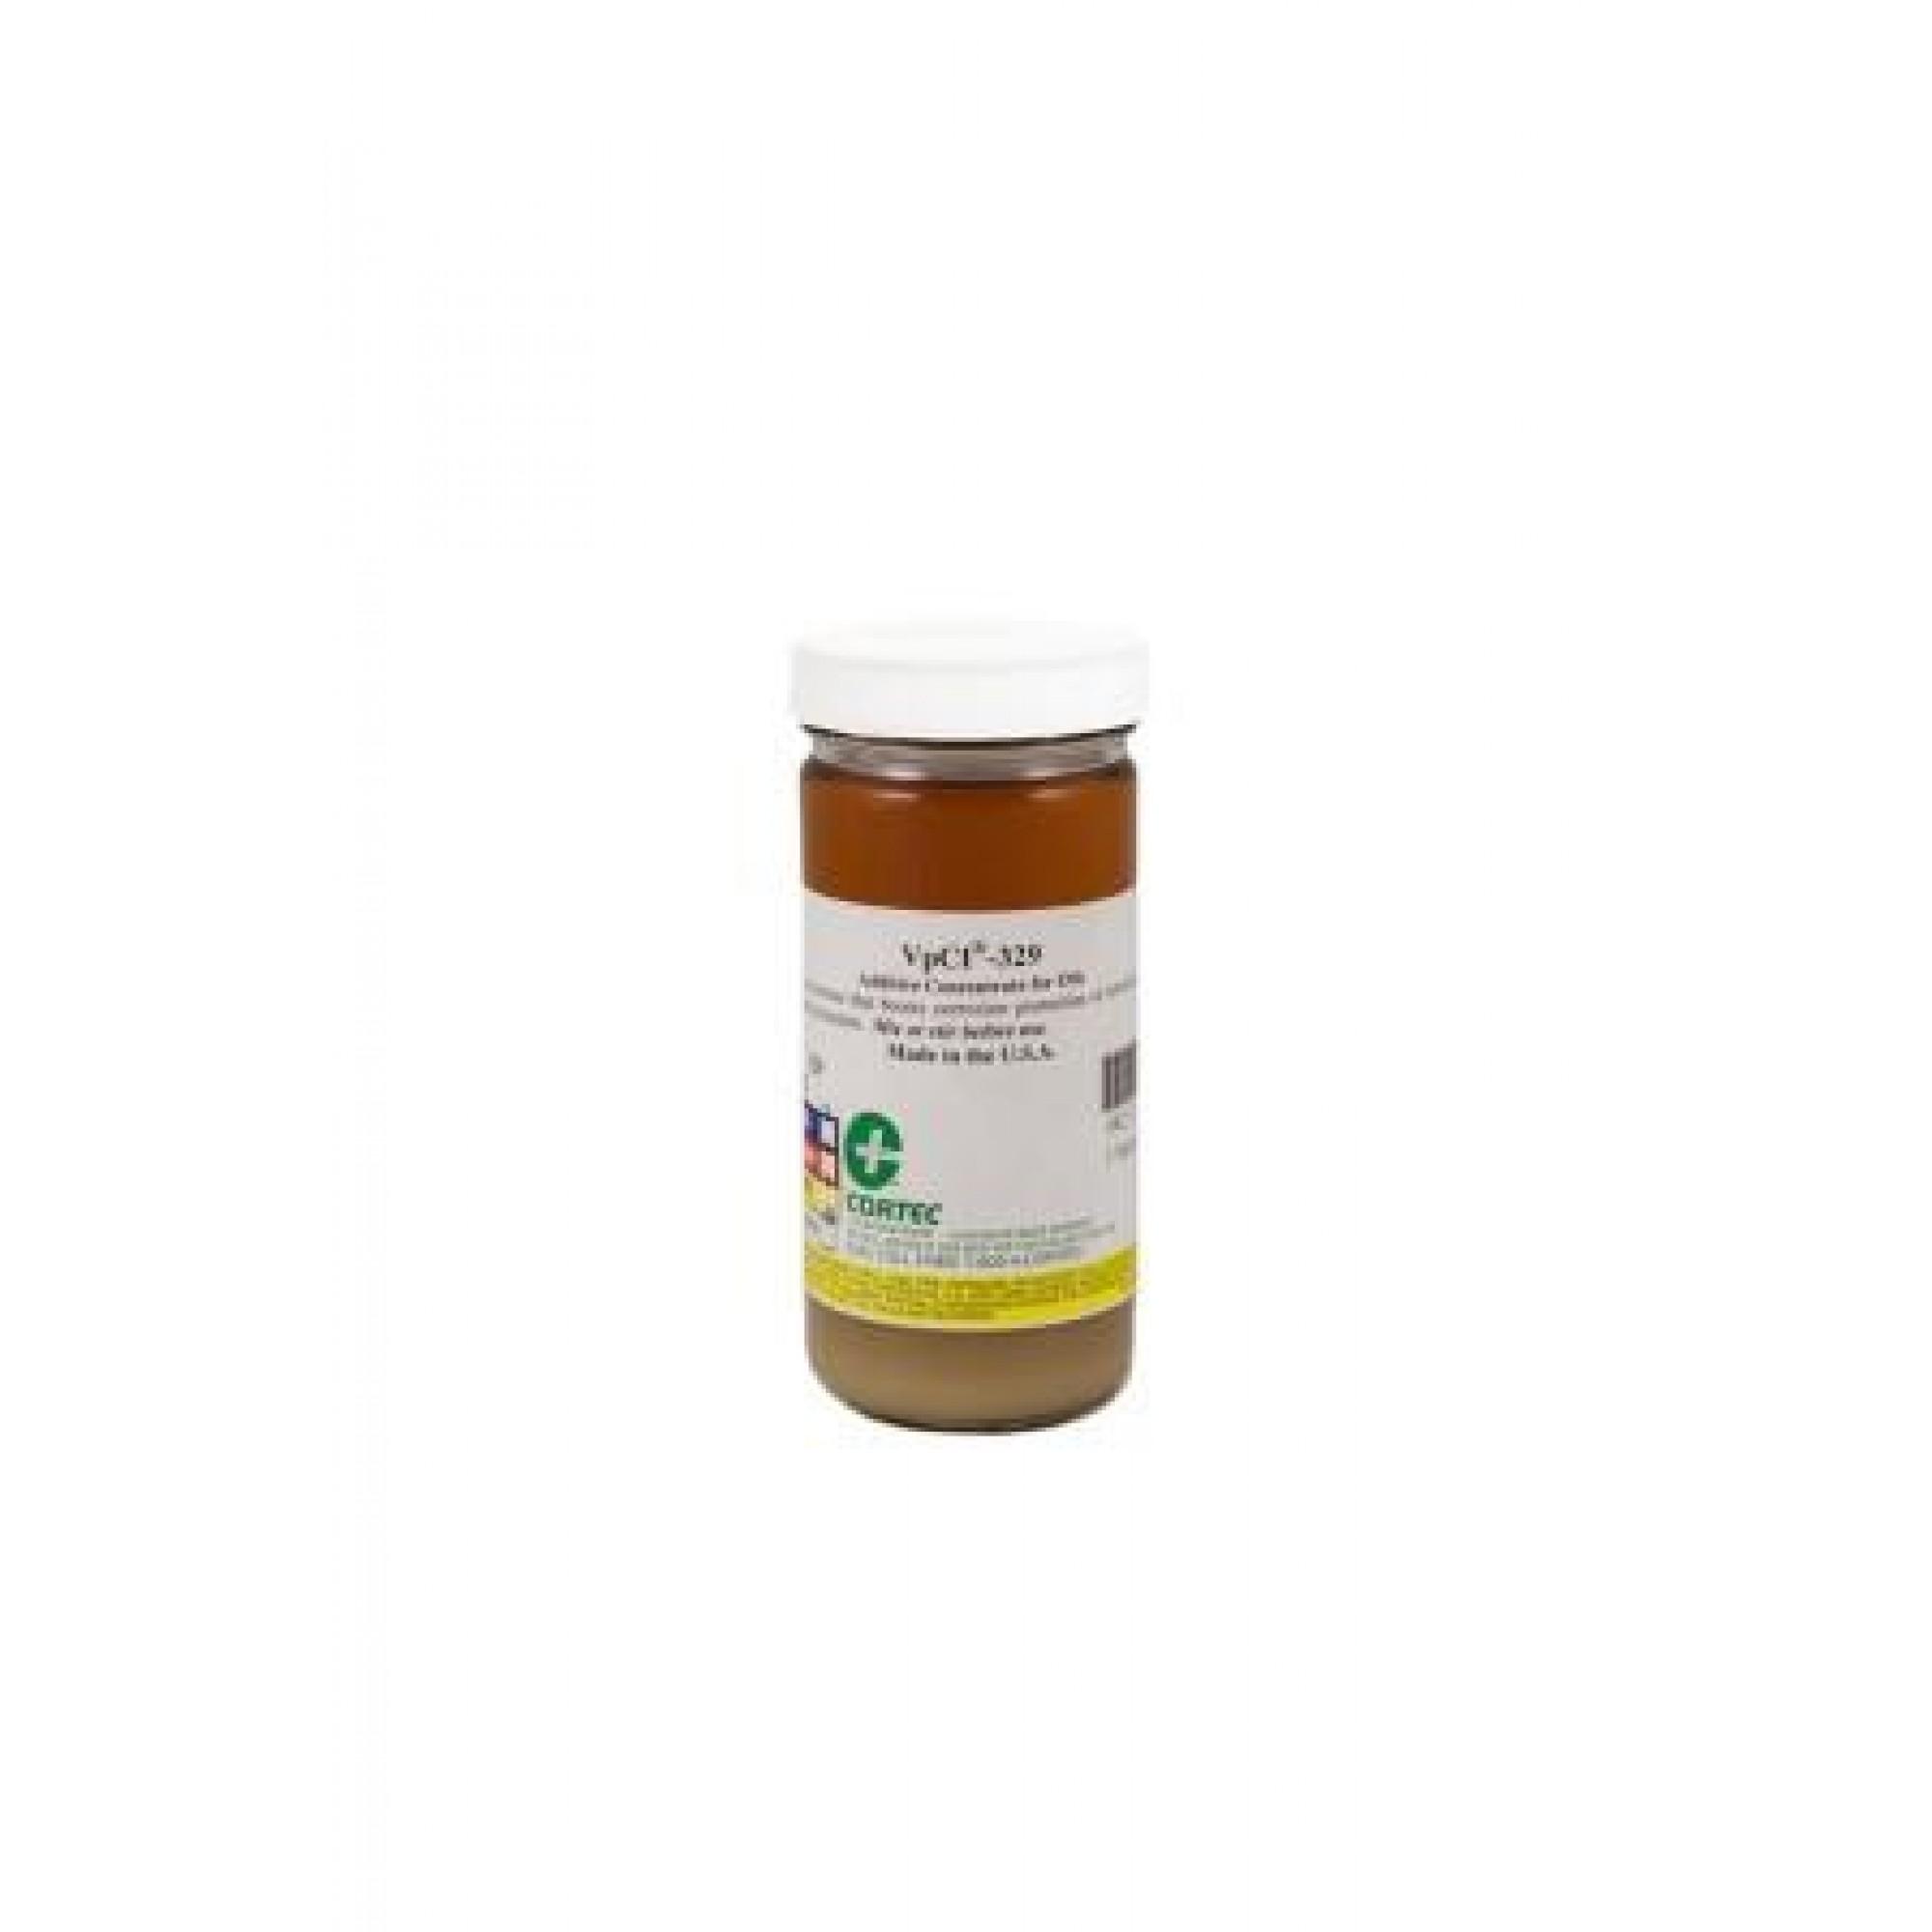 Volatile Corrosion Inhibitor